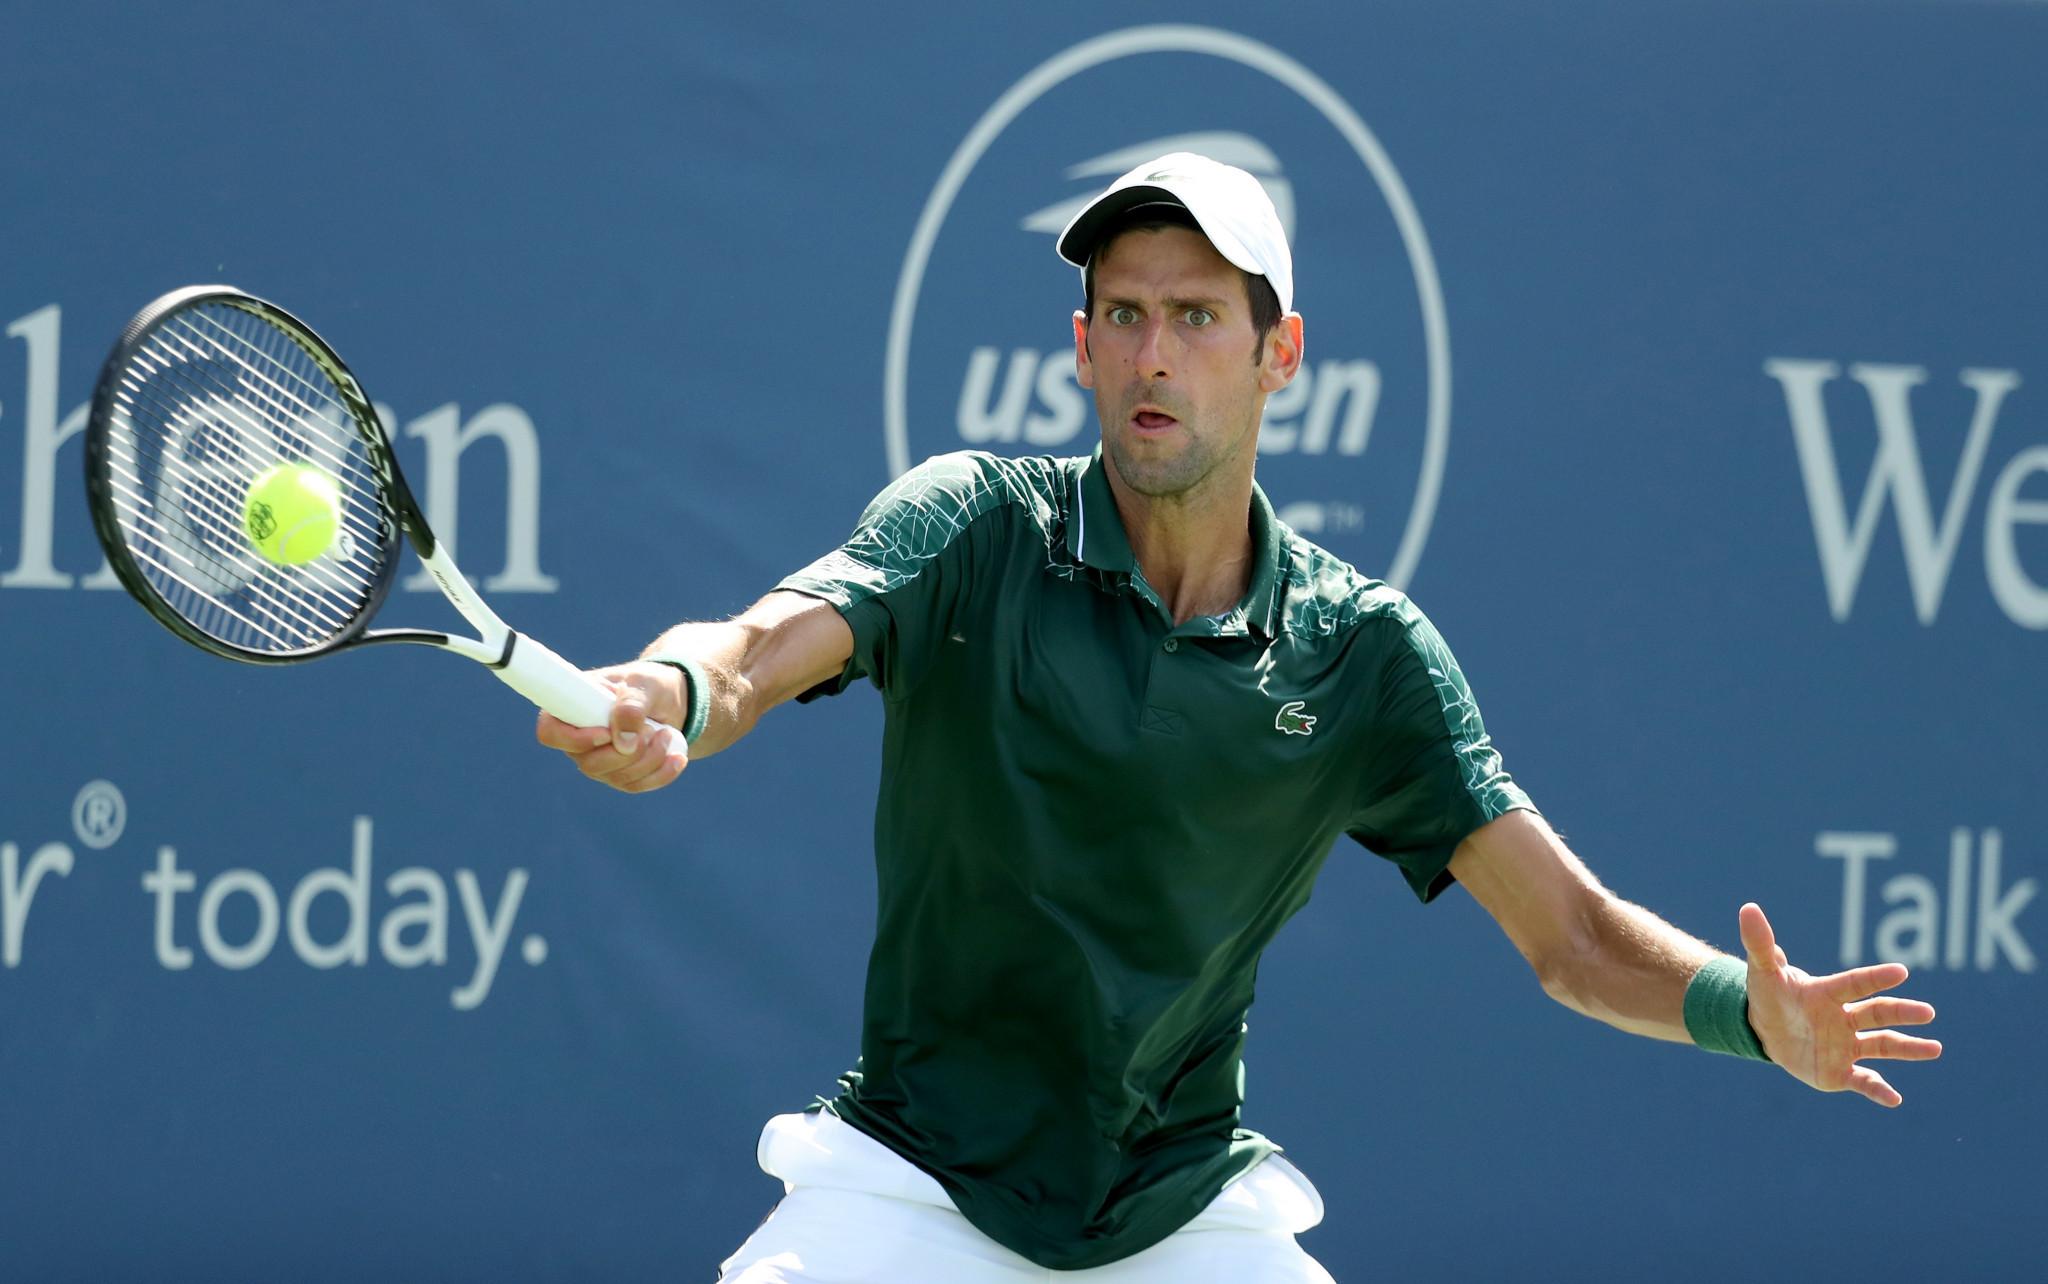 Djokovic closes in on elusive Masters 1000 title by reaching Cincinnati final